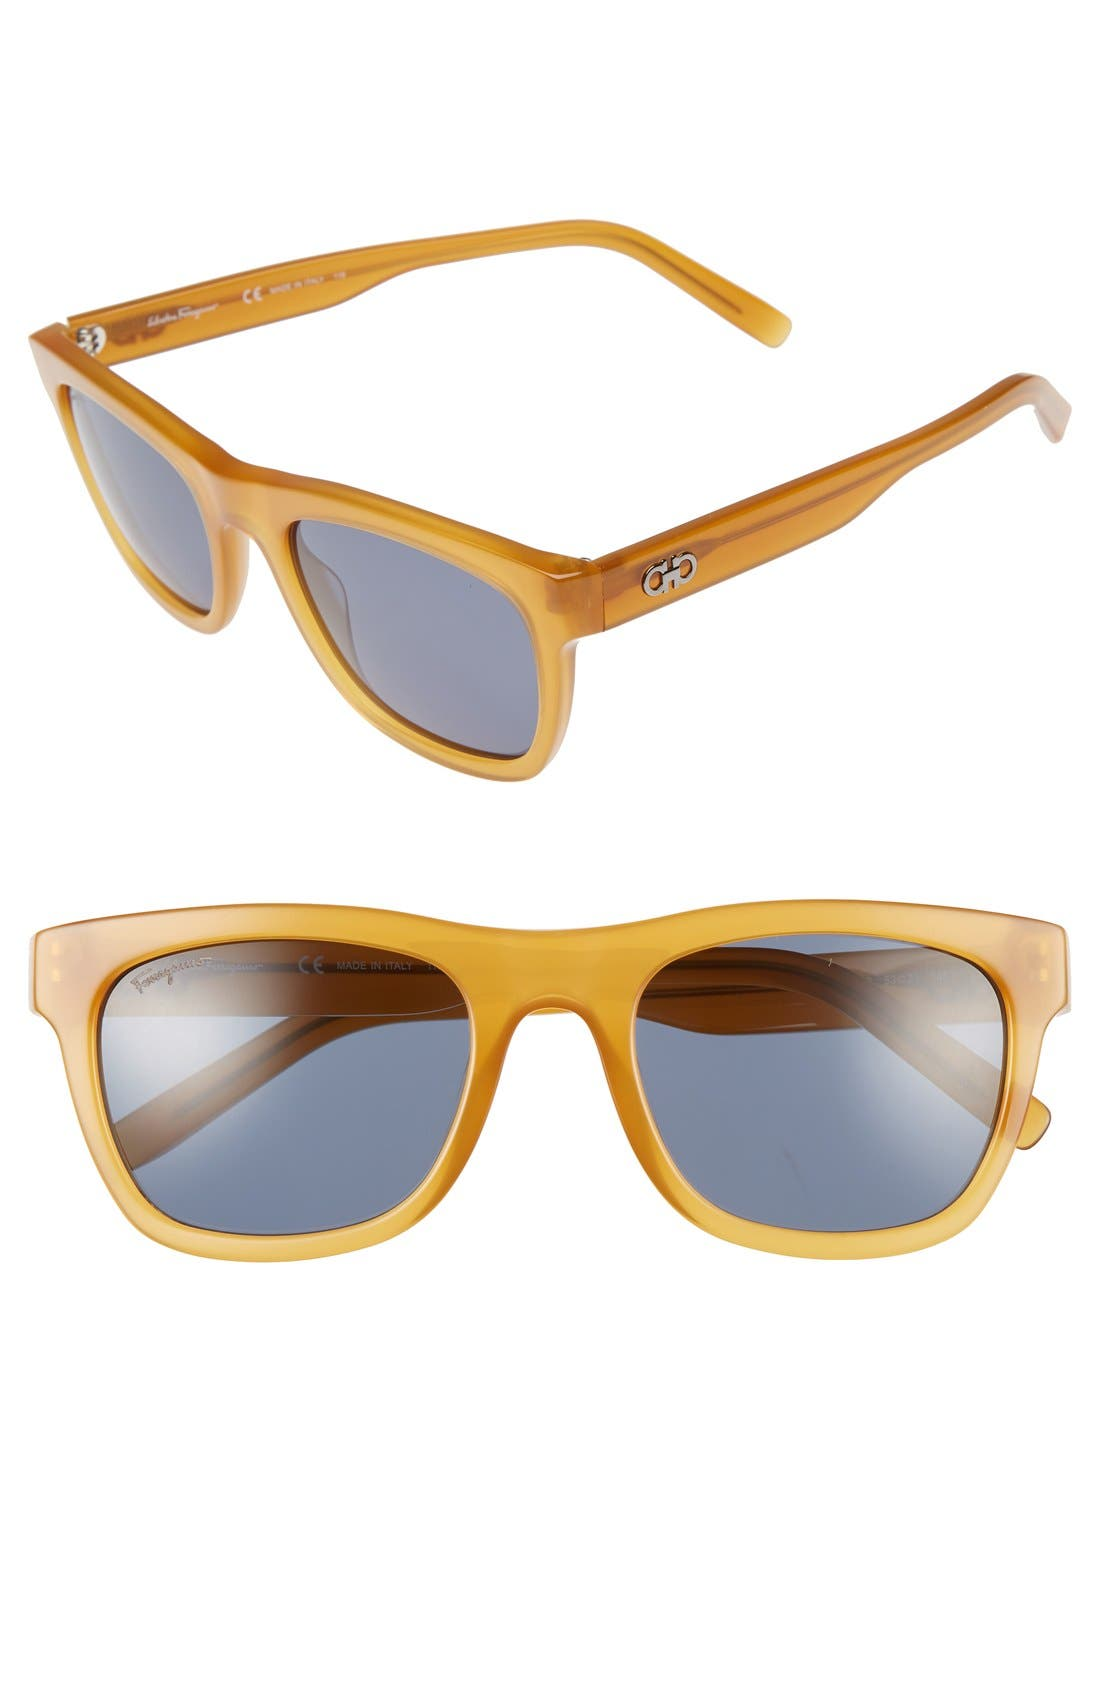 Salvatore Ferragamo 53mm Retro Sunglasses